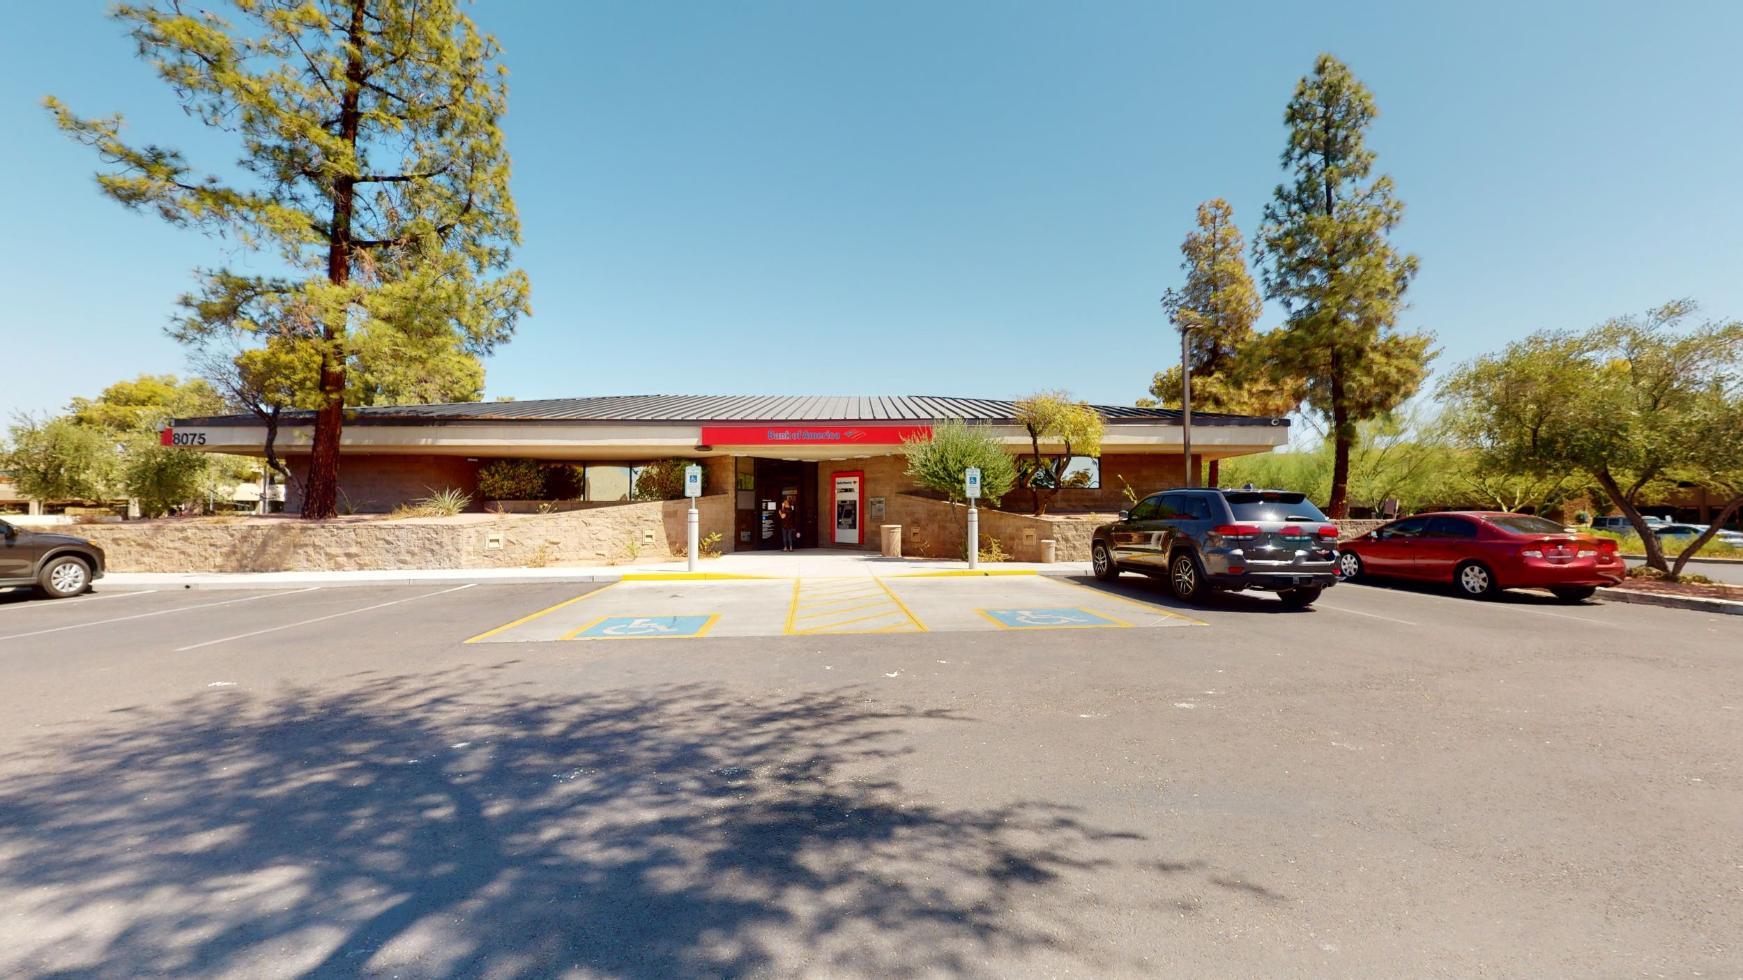 Bank of America financial center with drive-thru ATM | 8075 N Hayden Rd, Scottsdale, AZ 85258